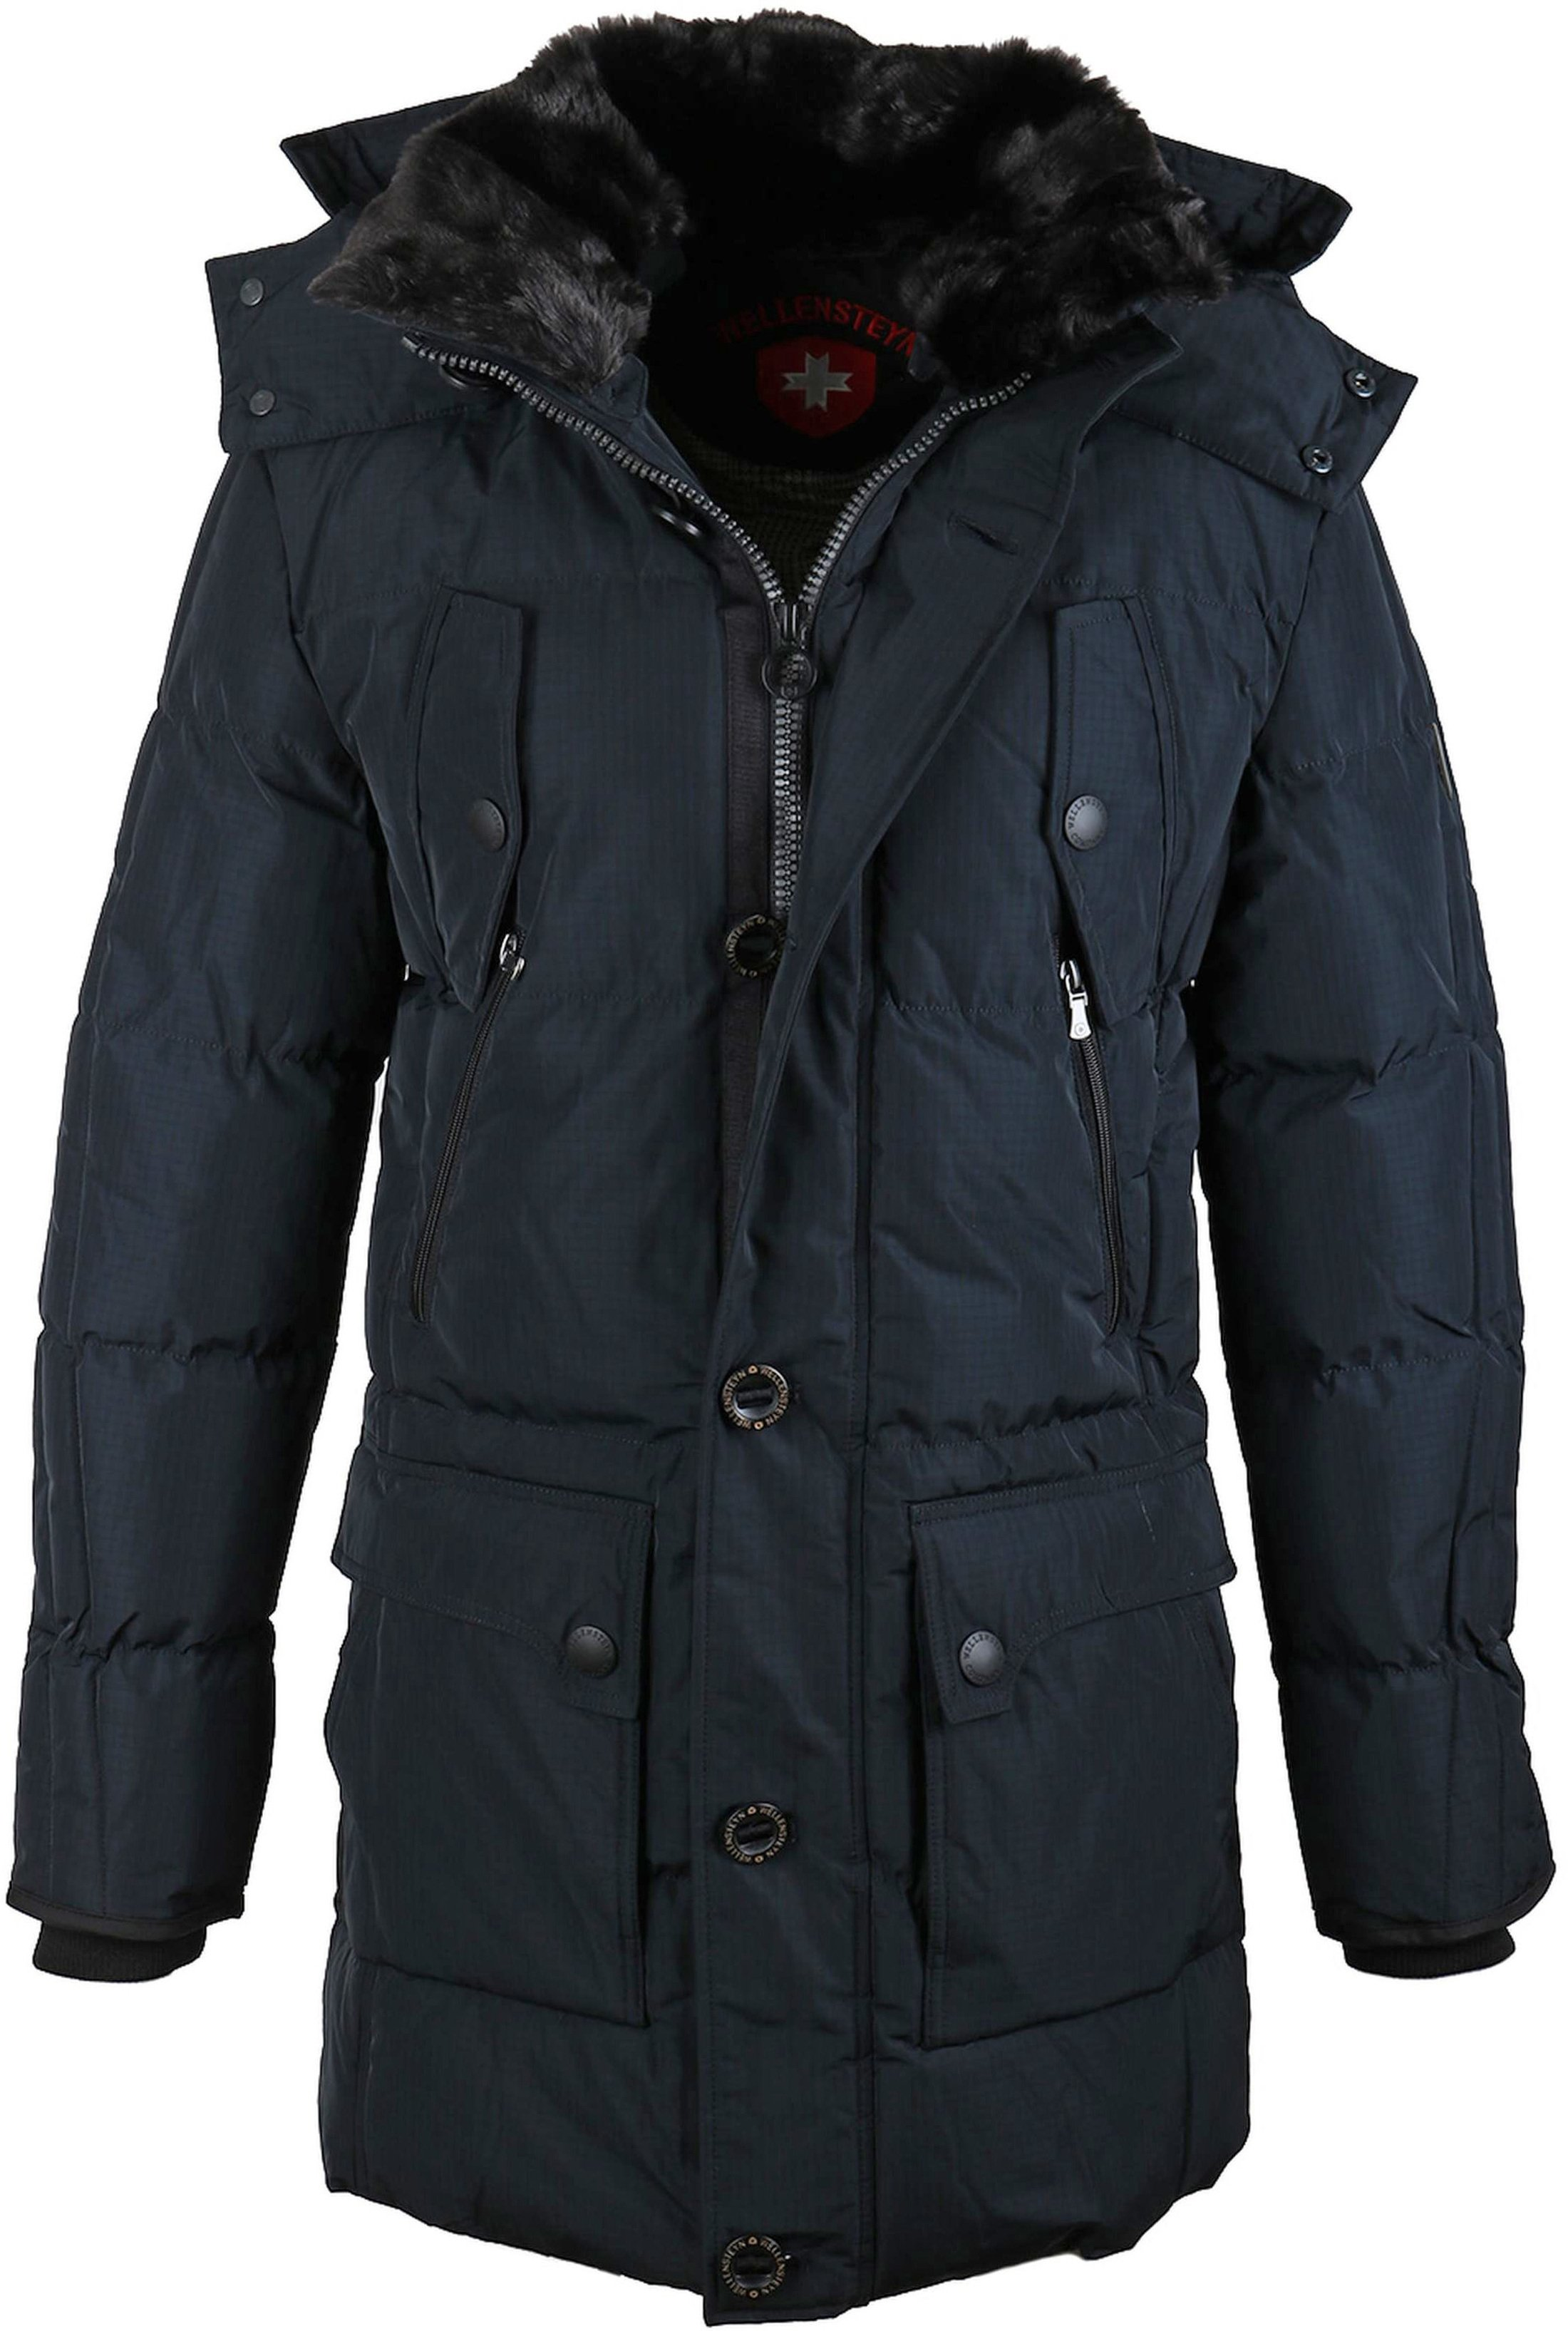 Donkerblauwe Winterjas.Wellensteyn Centurion Winterjas Donkerblauw Cent 519 Nac